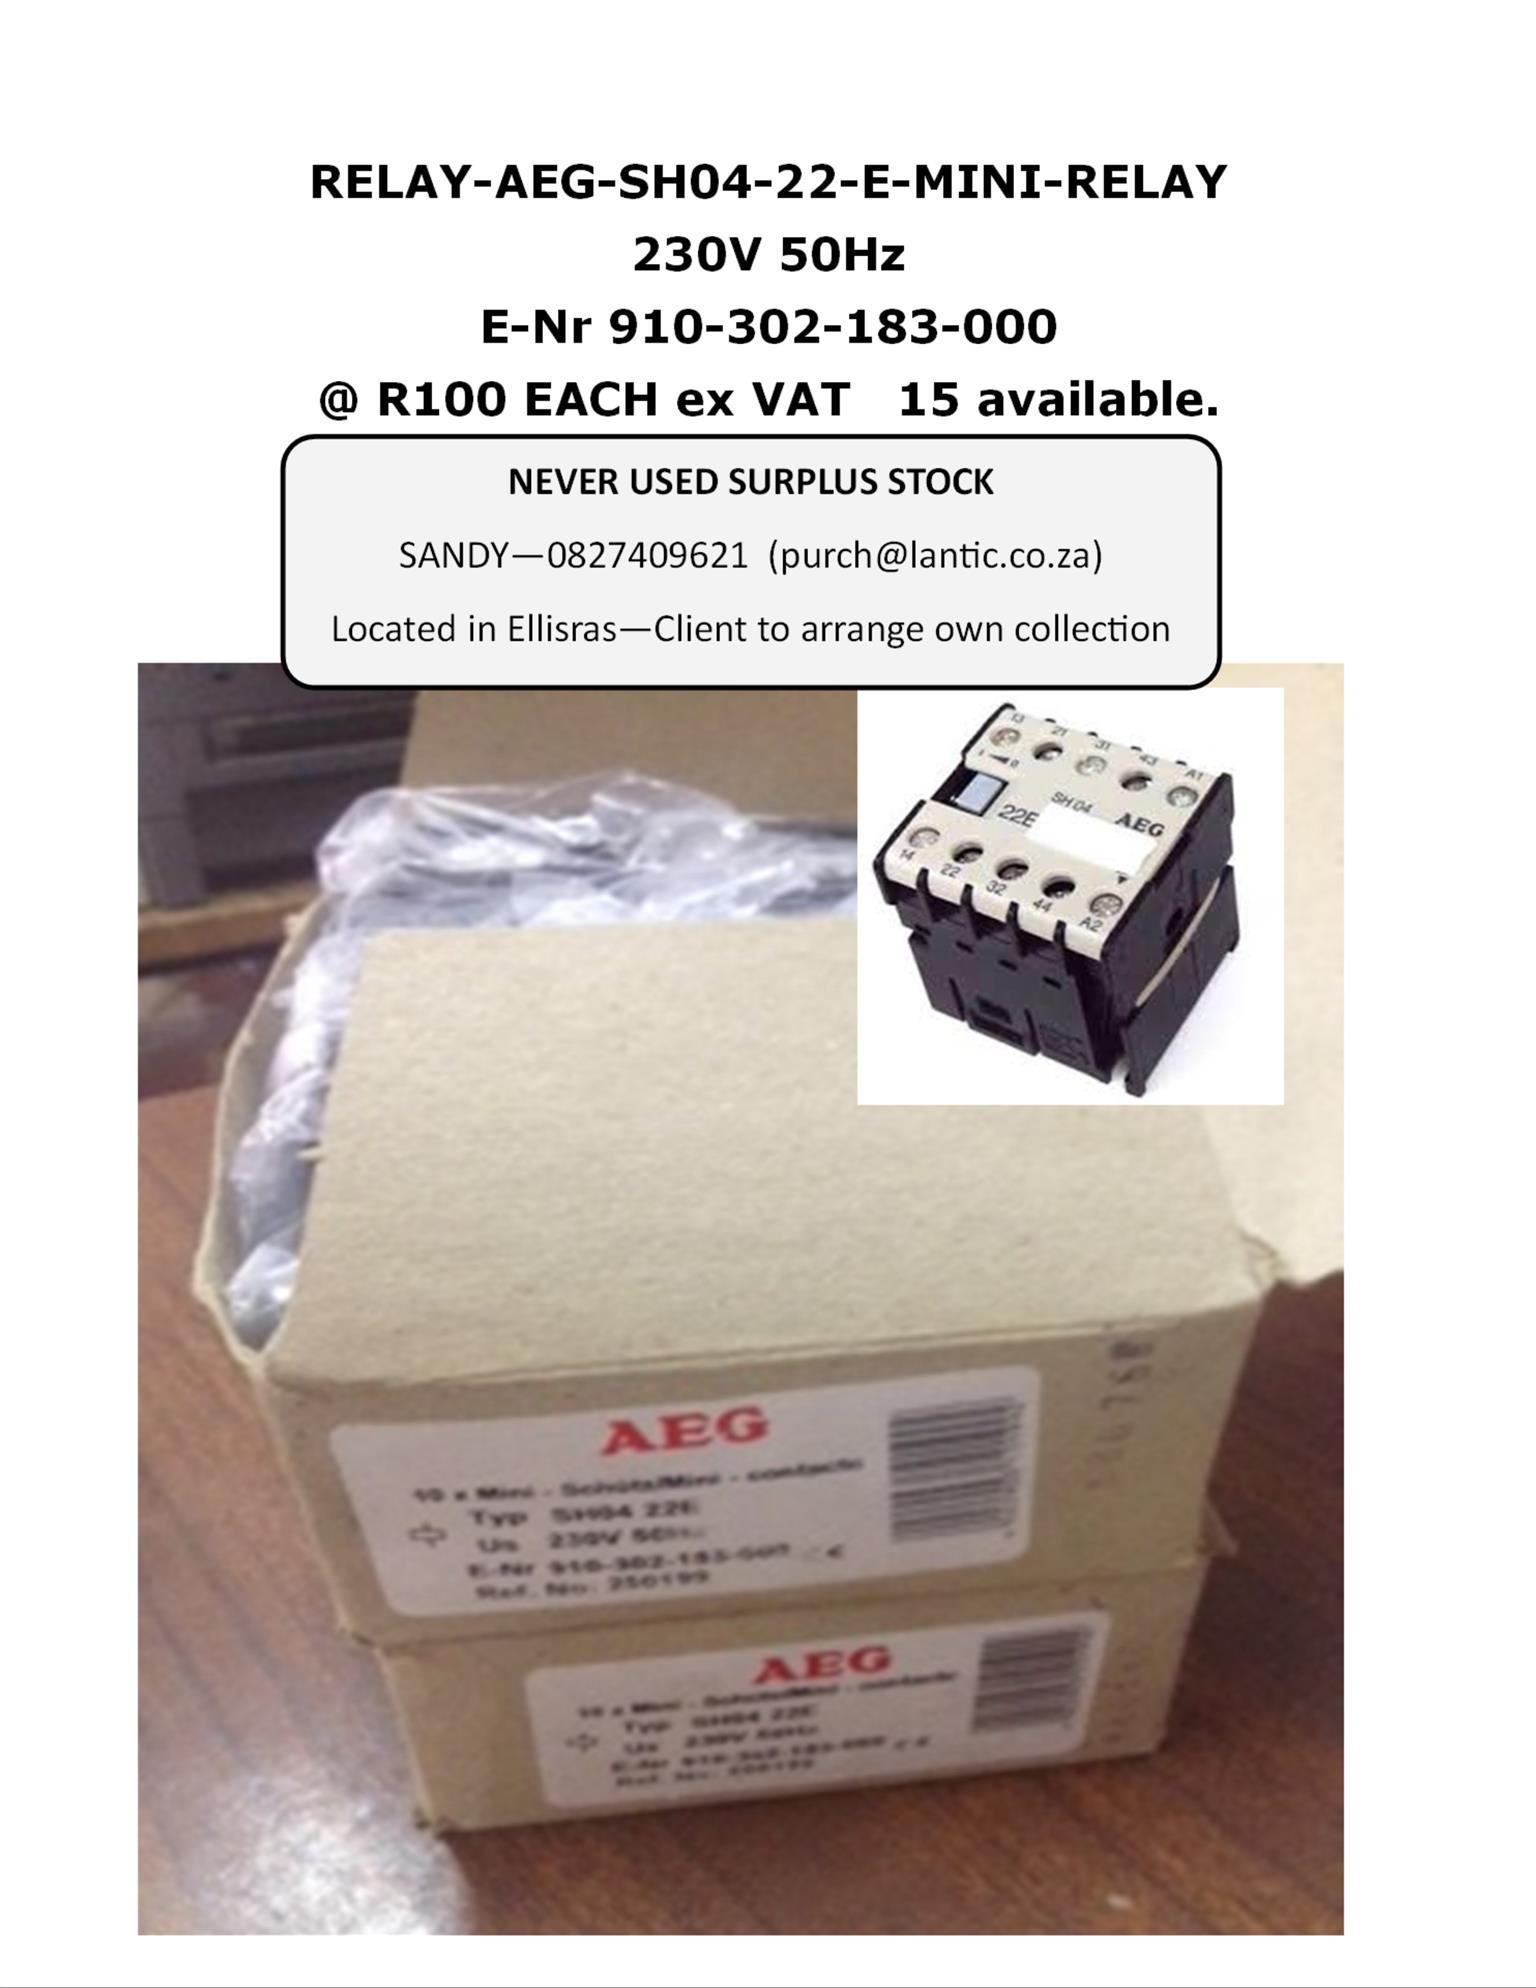 RELAY-AEG-SH04-22-E-MINI-RELAY 230V 50Hz  E-Nr 910-302-183-000